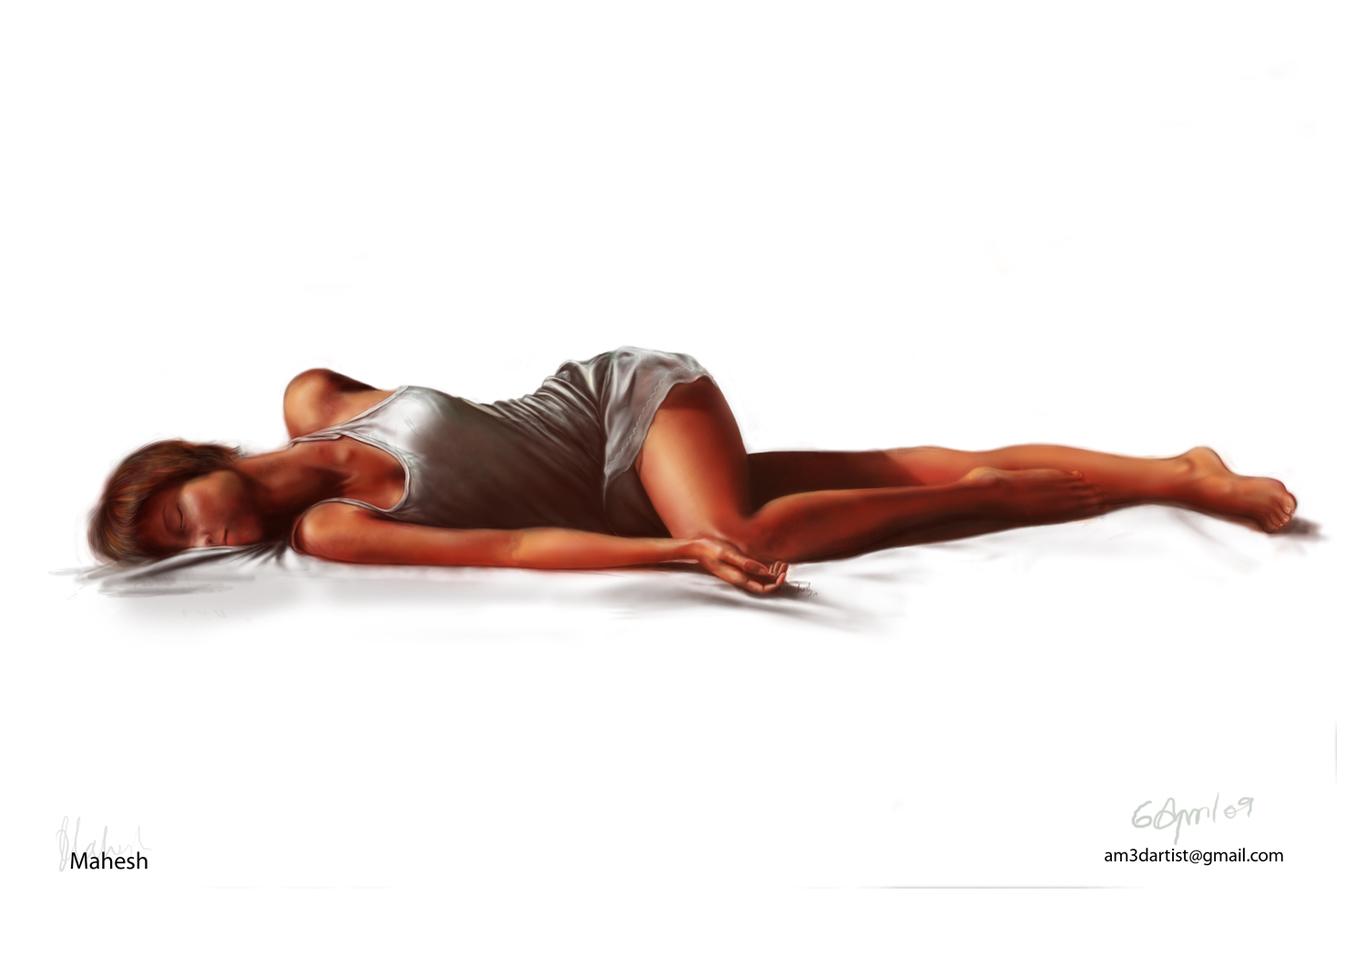 Mahe4art sleeping beauty 1 c183bce0 gpr9